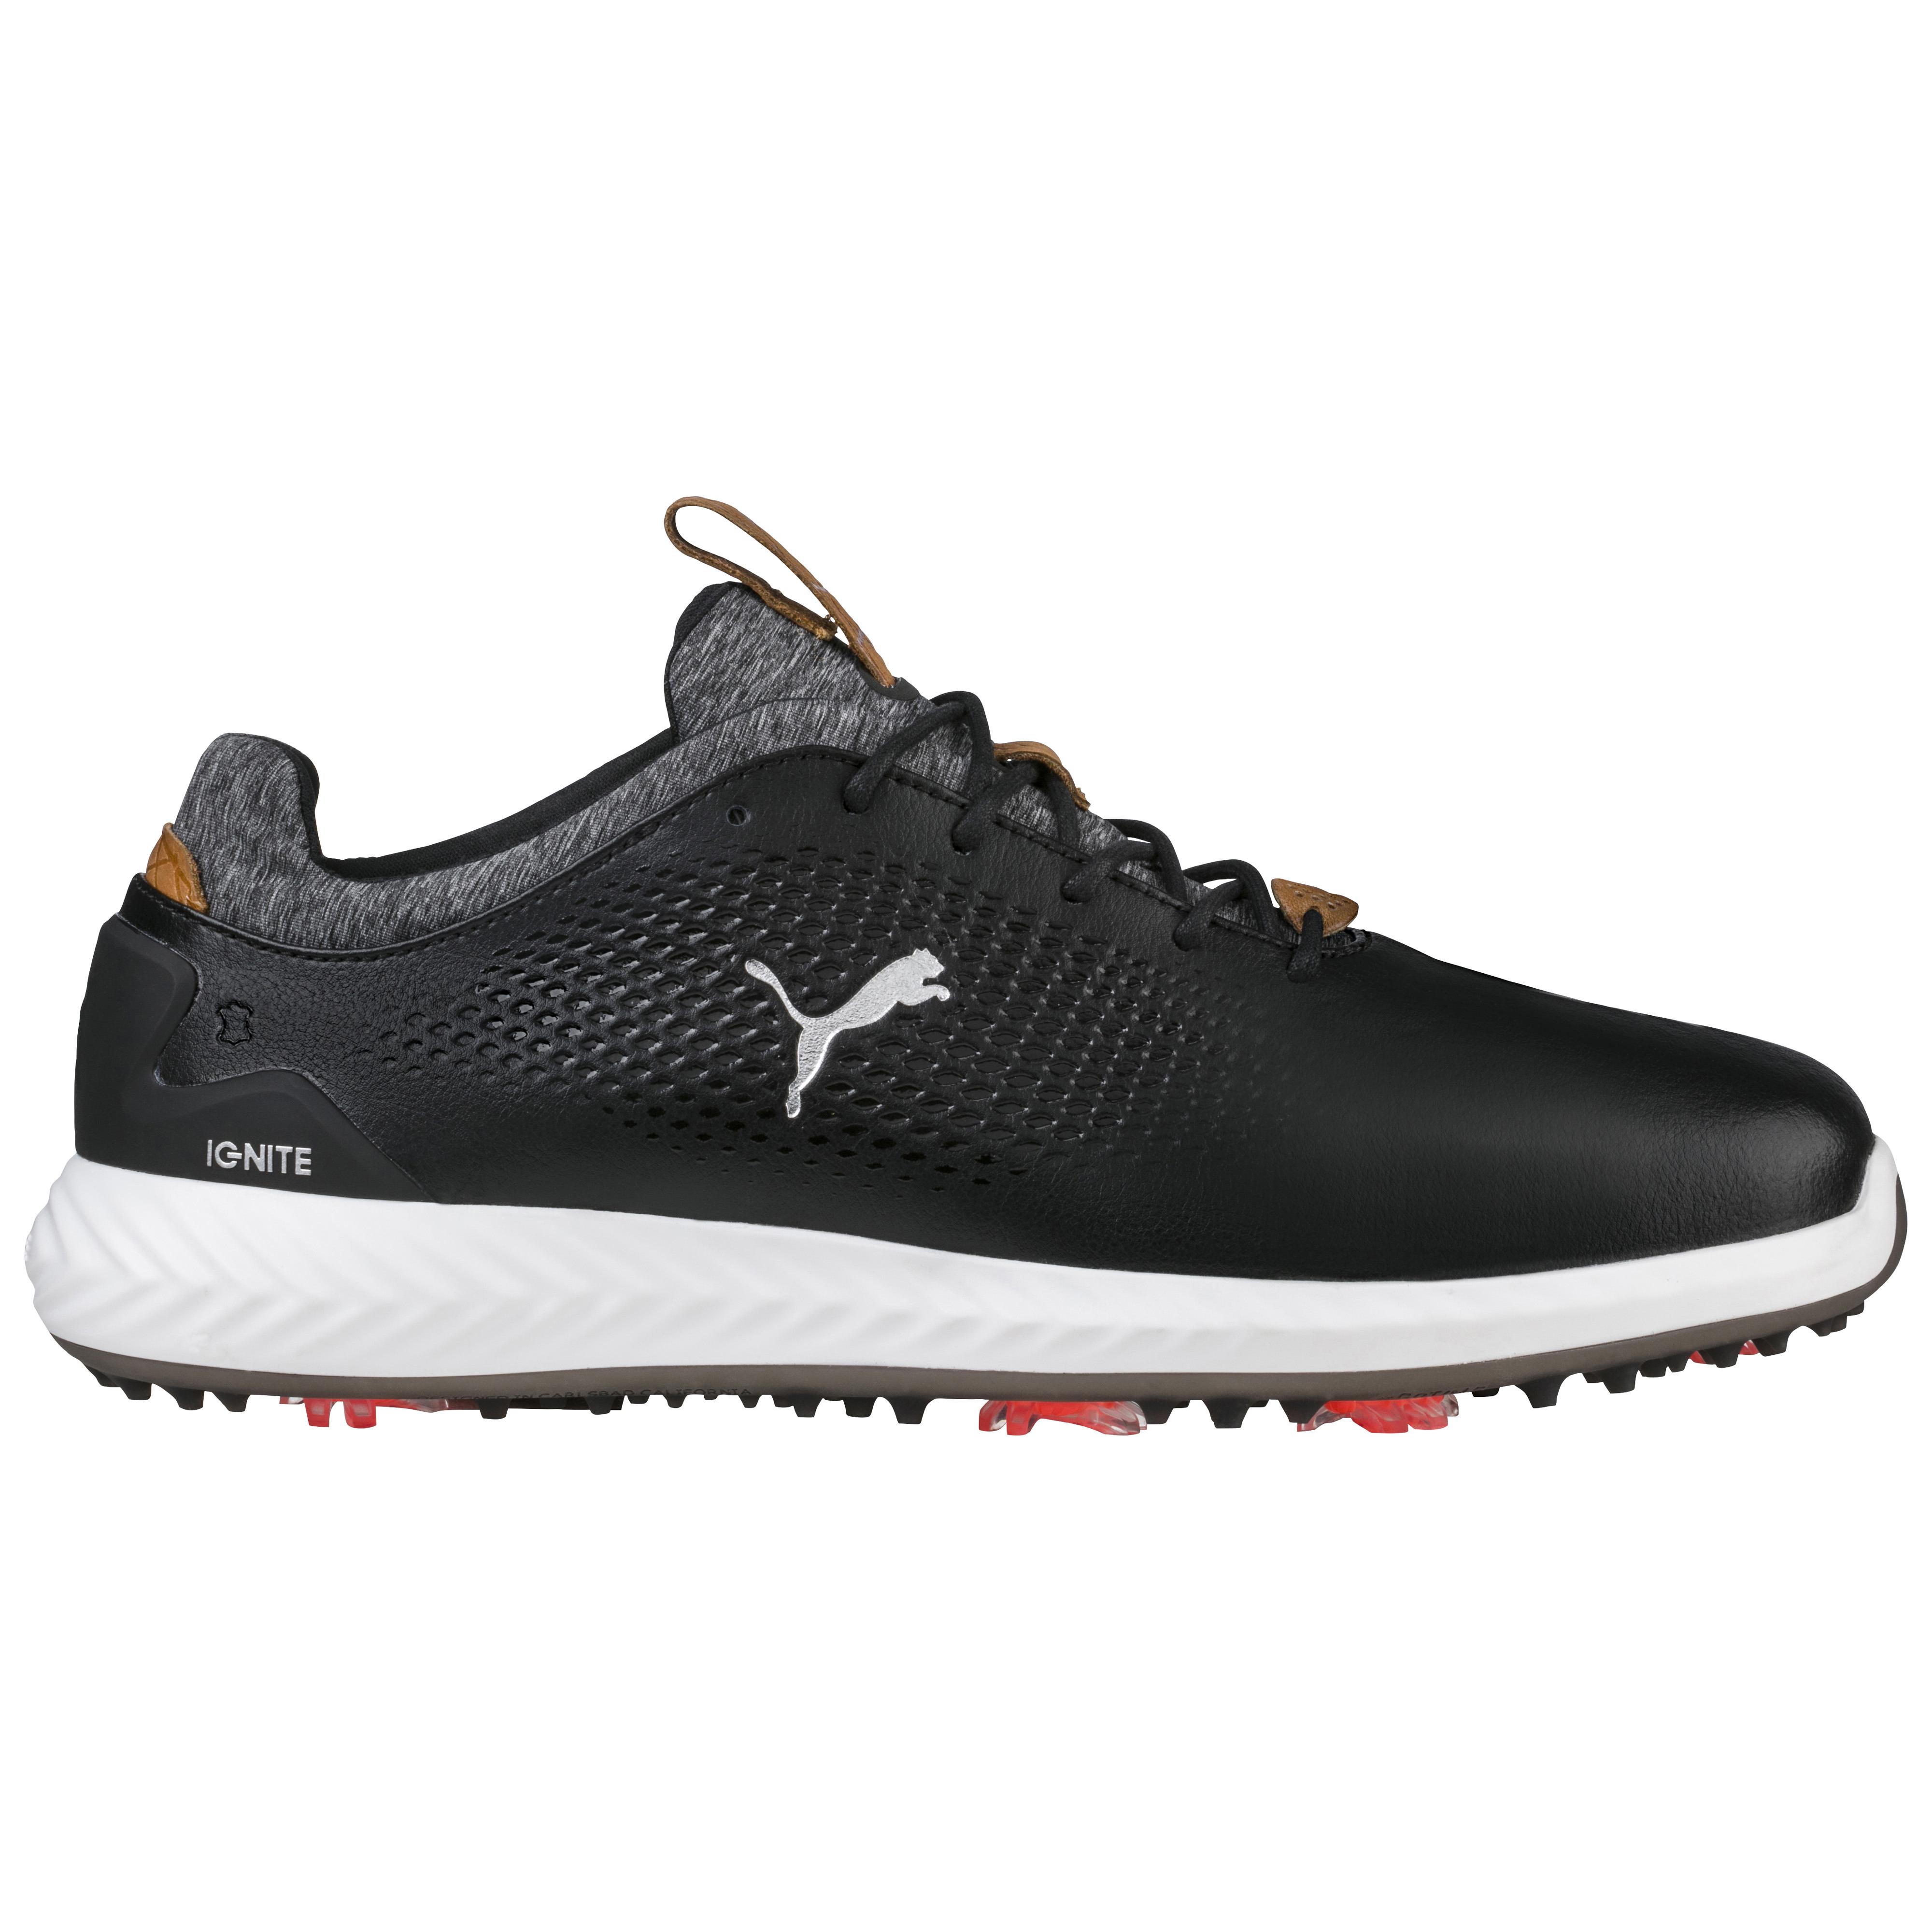 bd52ba4e1d4 Puma Golf- Ignite PWRADAPT Leather Shoes